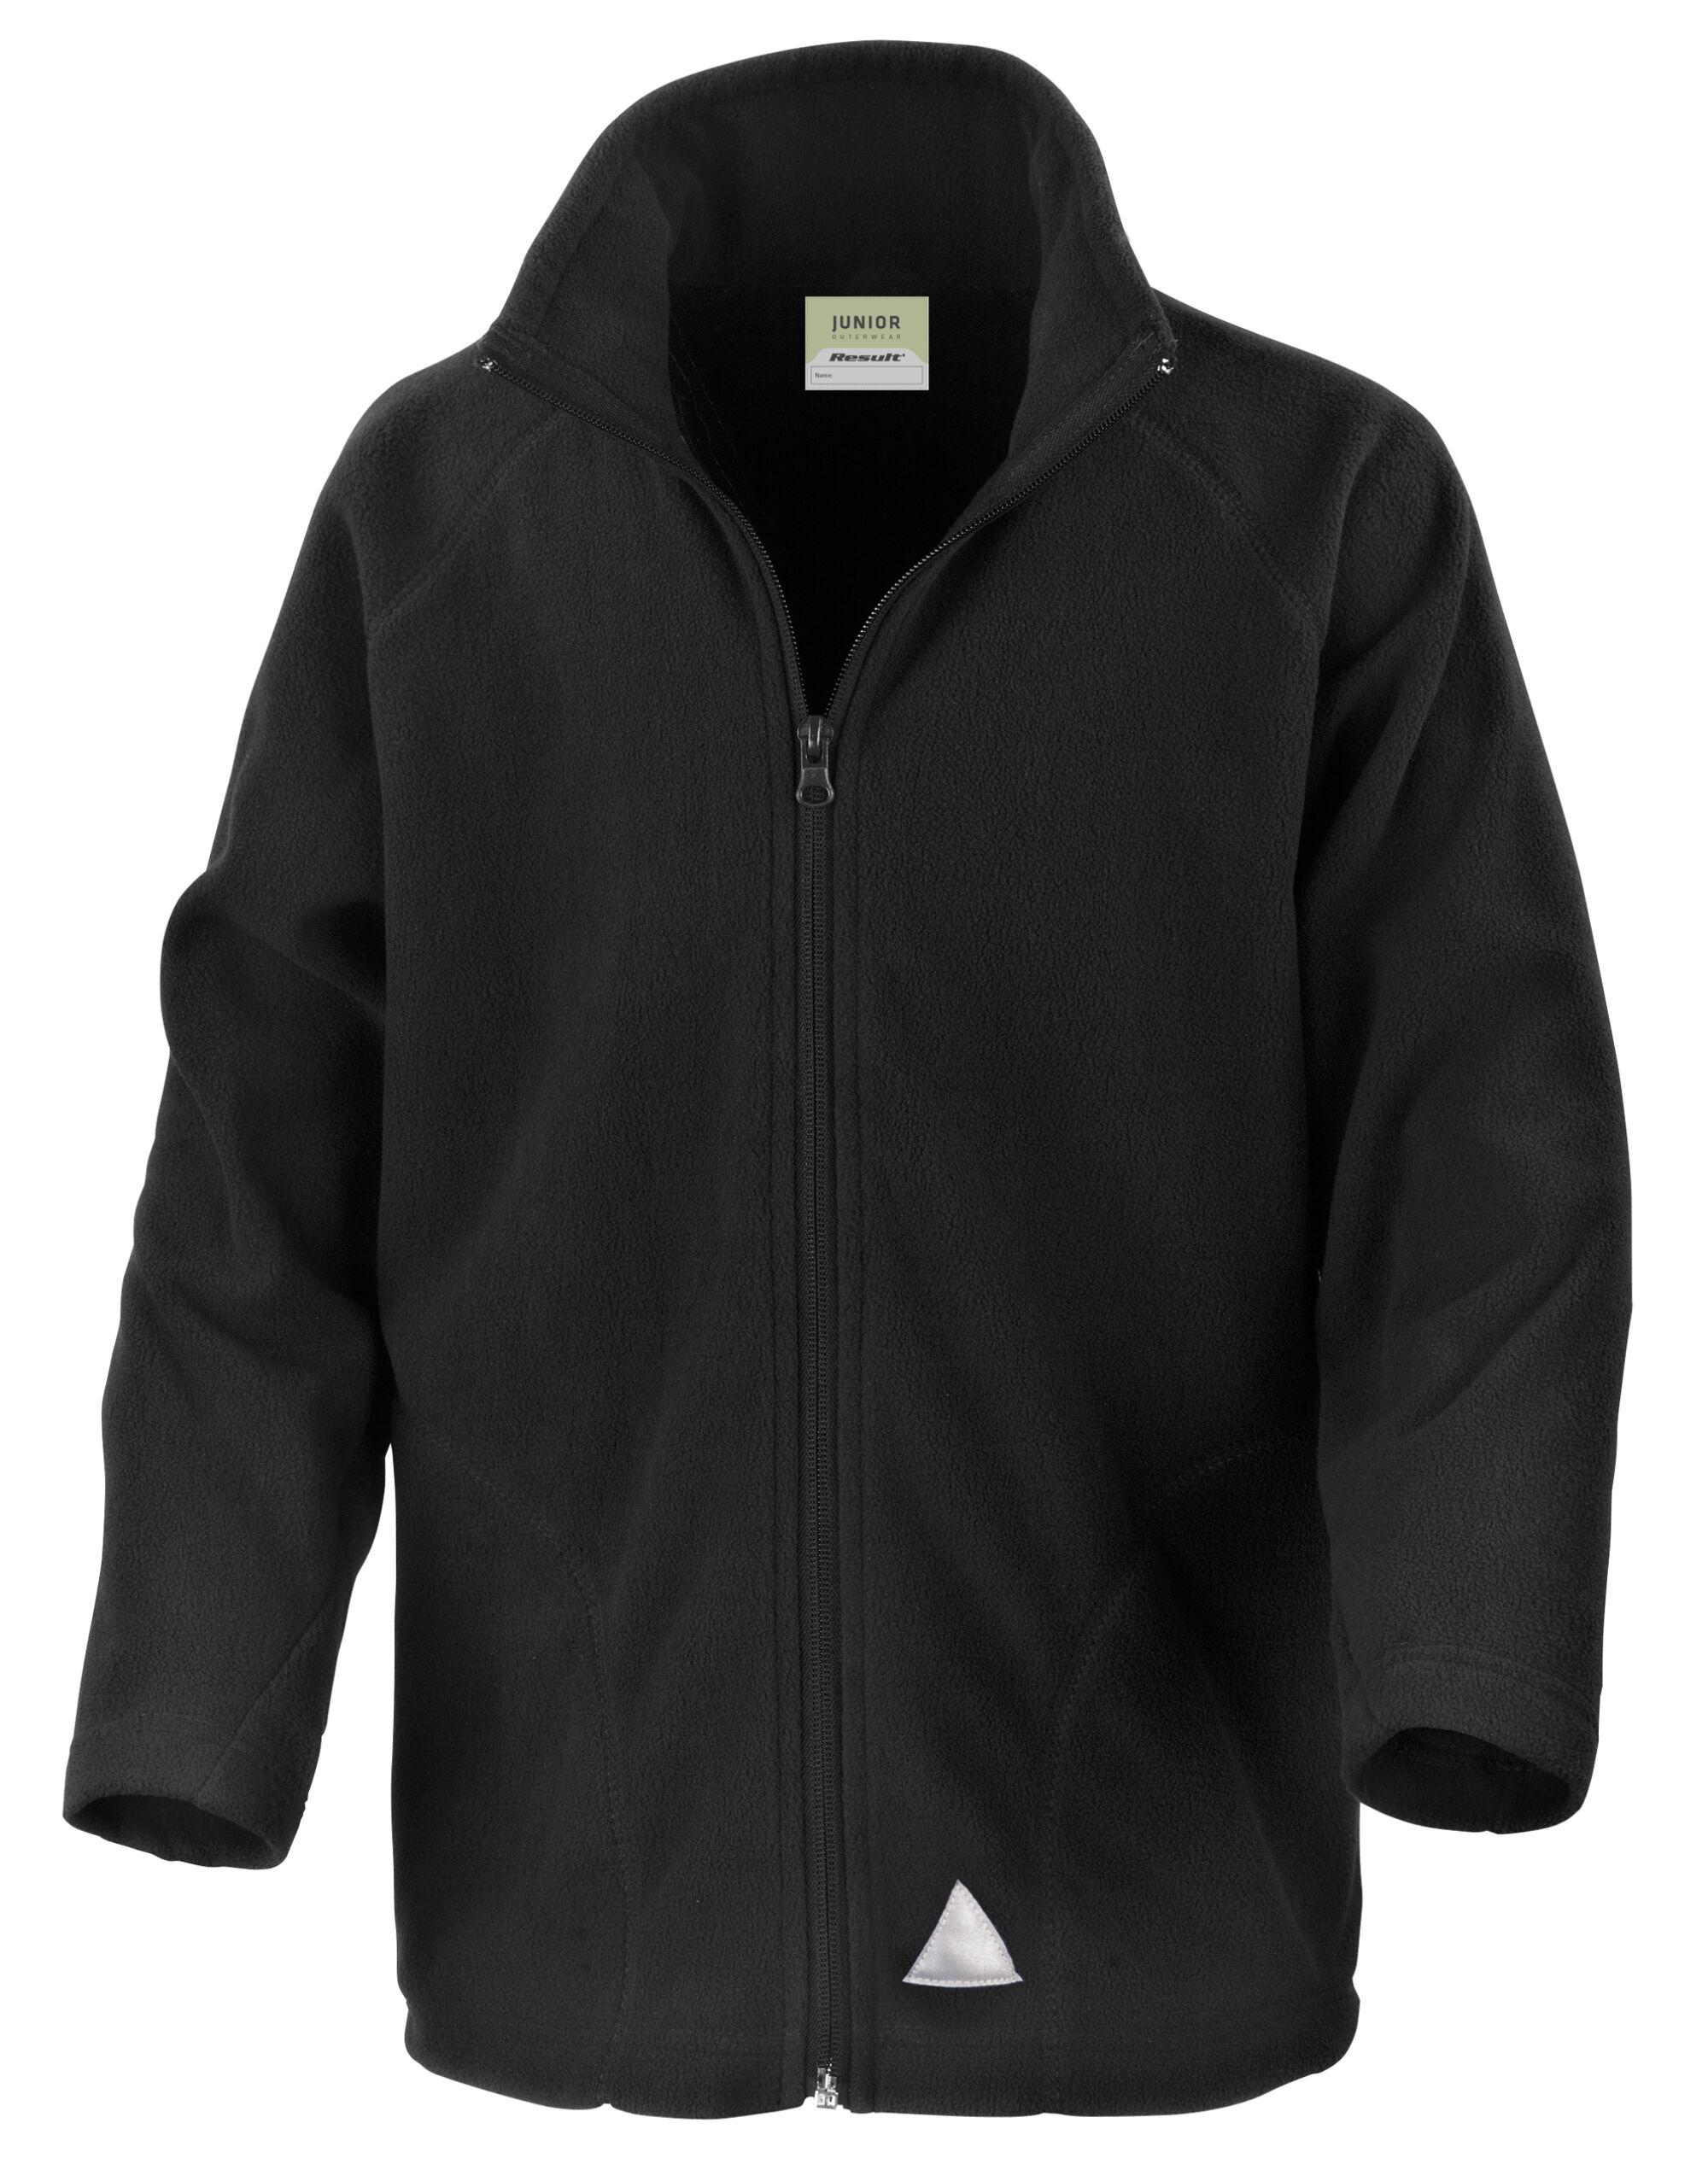 Core Children's Micron Fleece Jacket